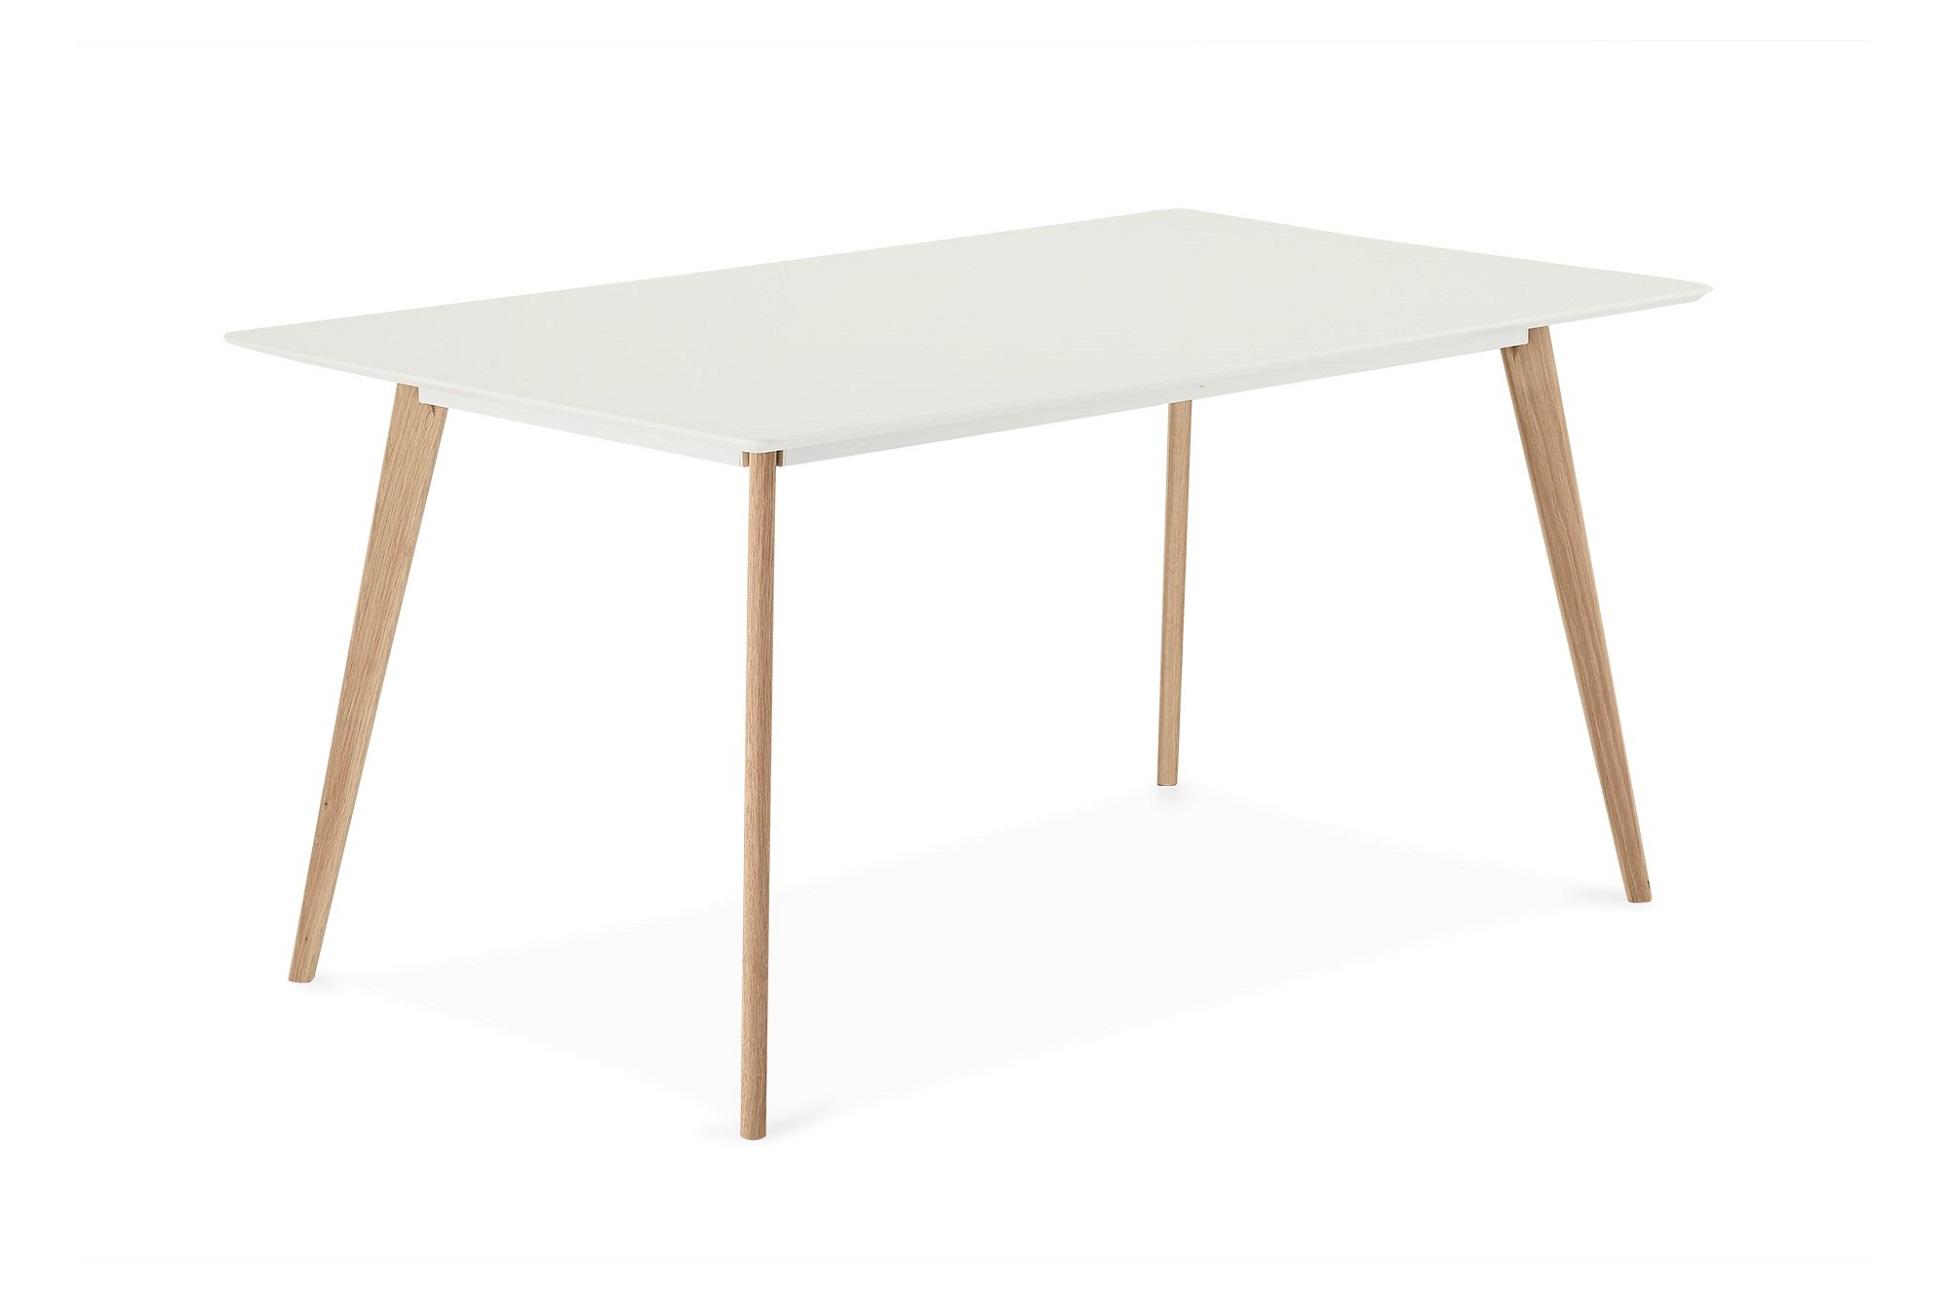 Designový jídelní stůl Aaden, bílá / dub